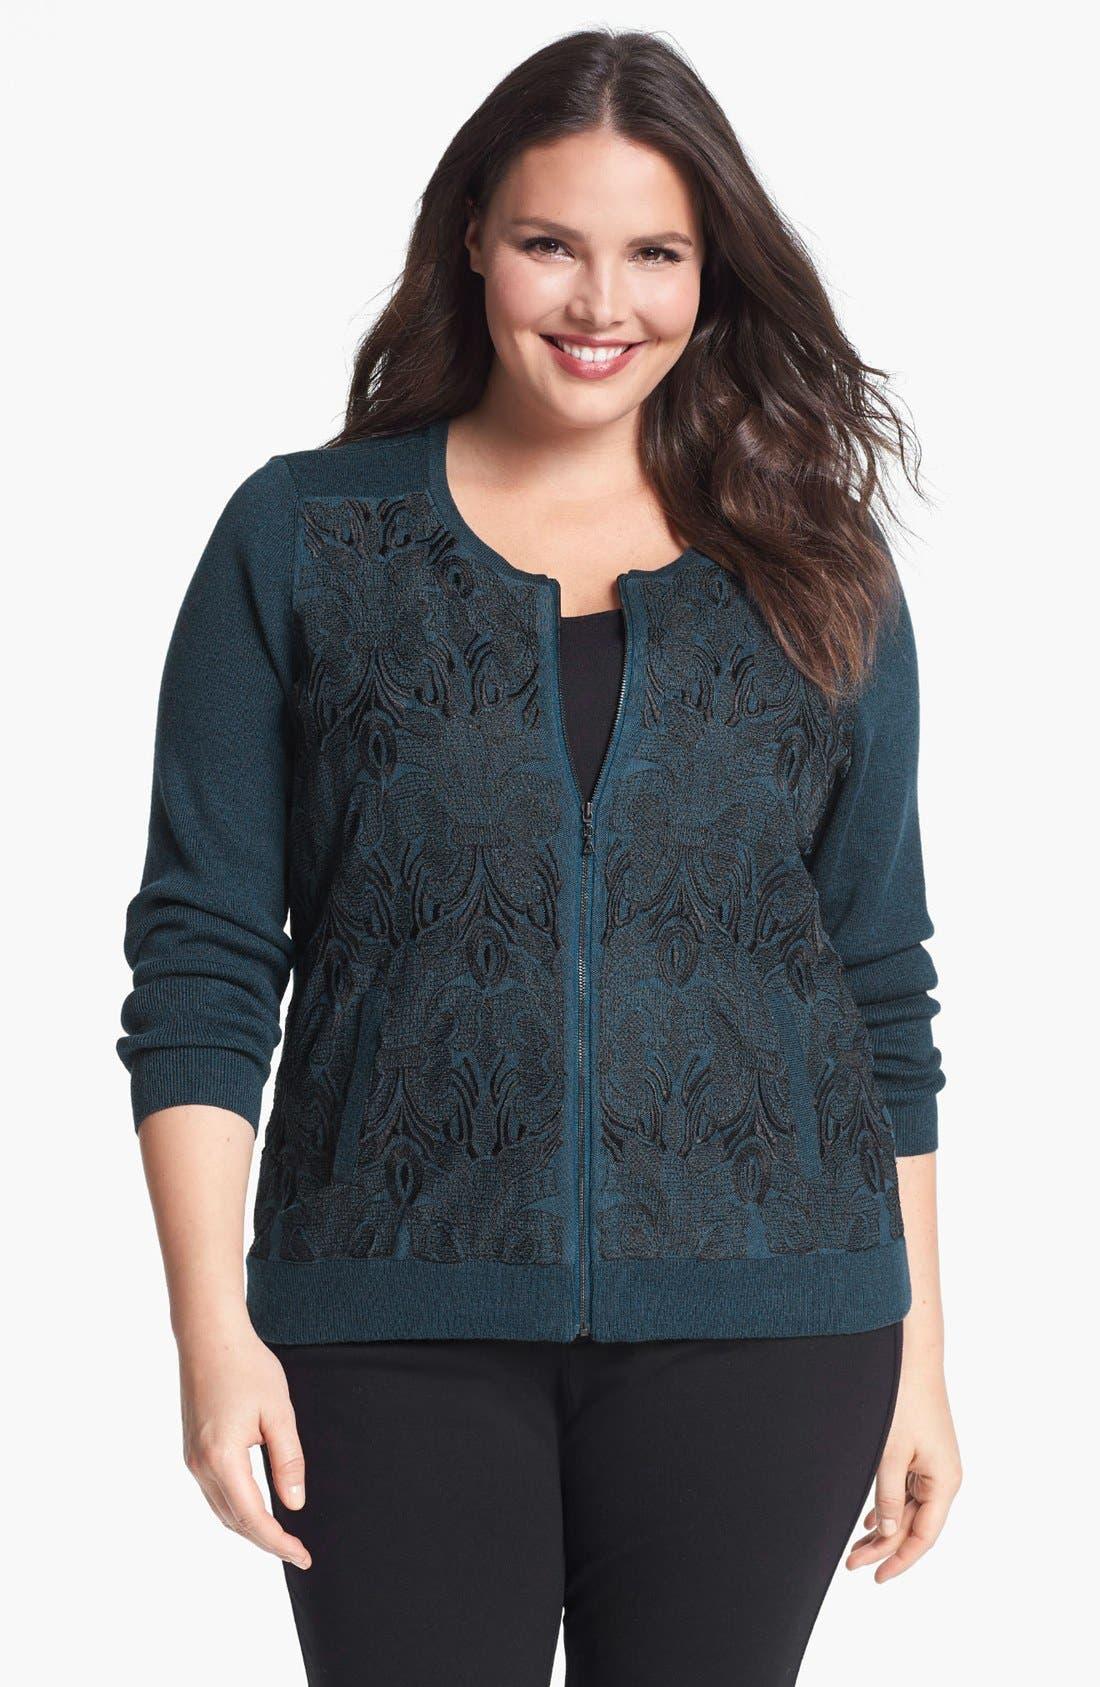 Alternate Image 1 Selected - NIC+ZOE Lace Front Sweater Jacket (Plus Size)